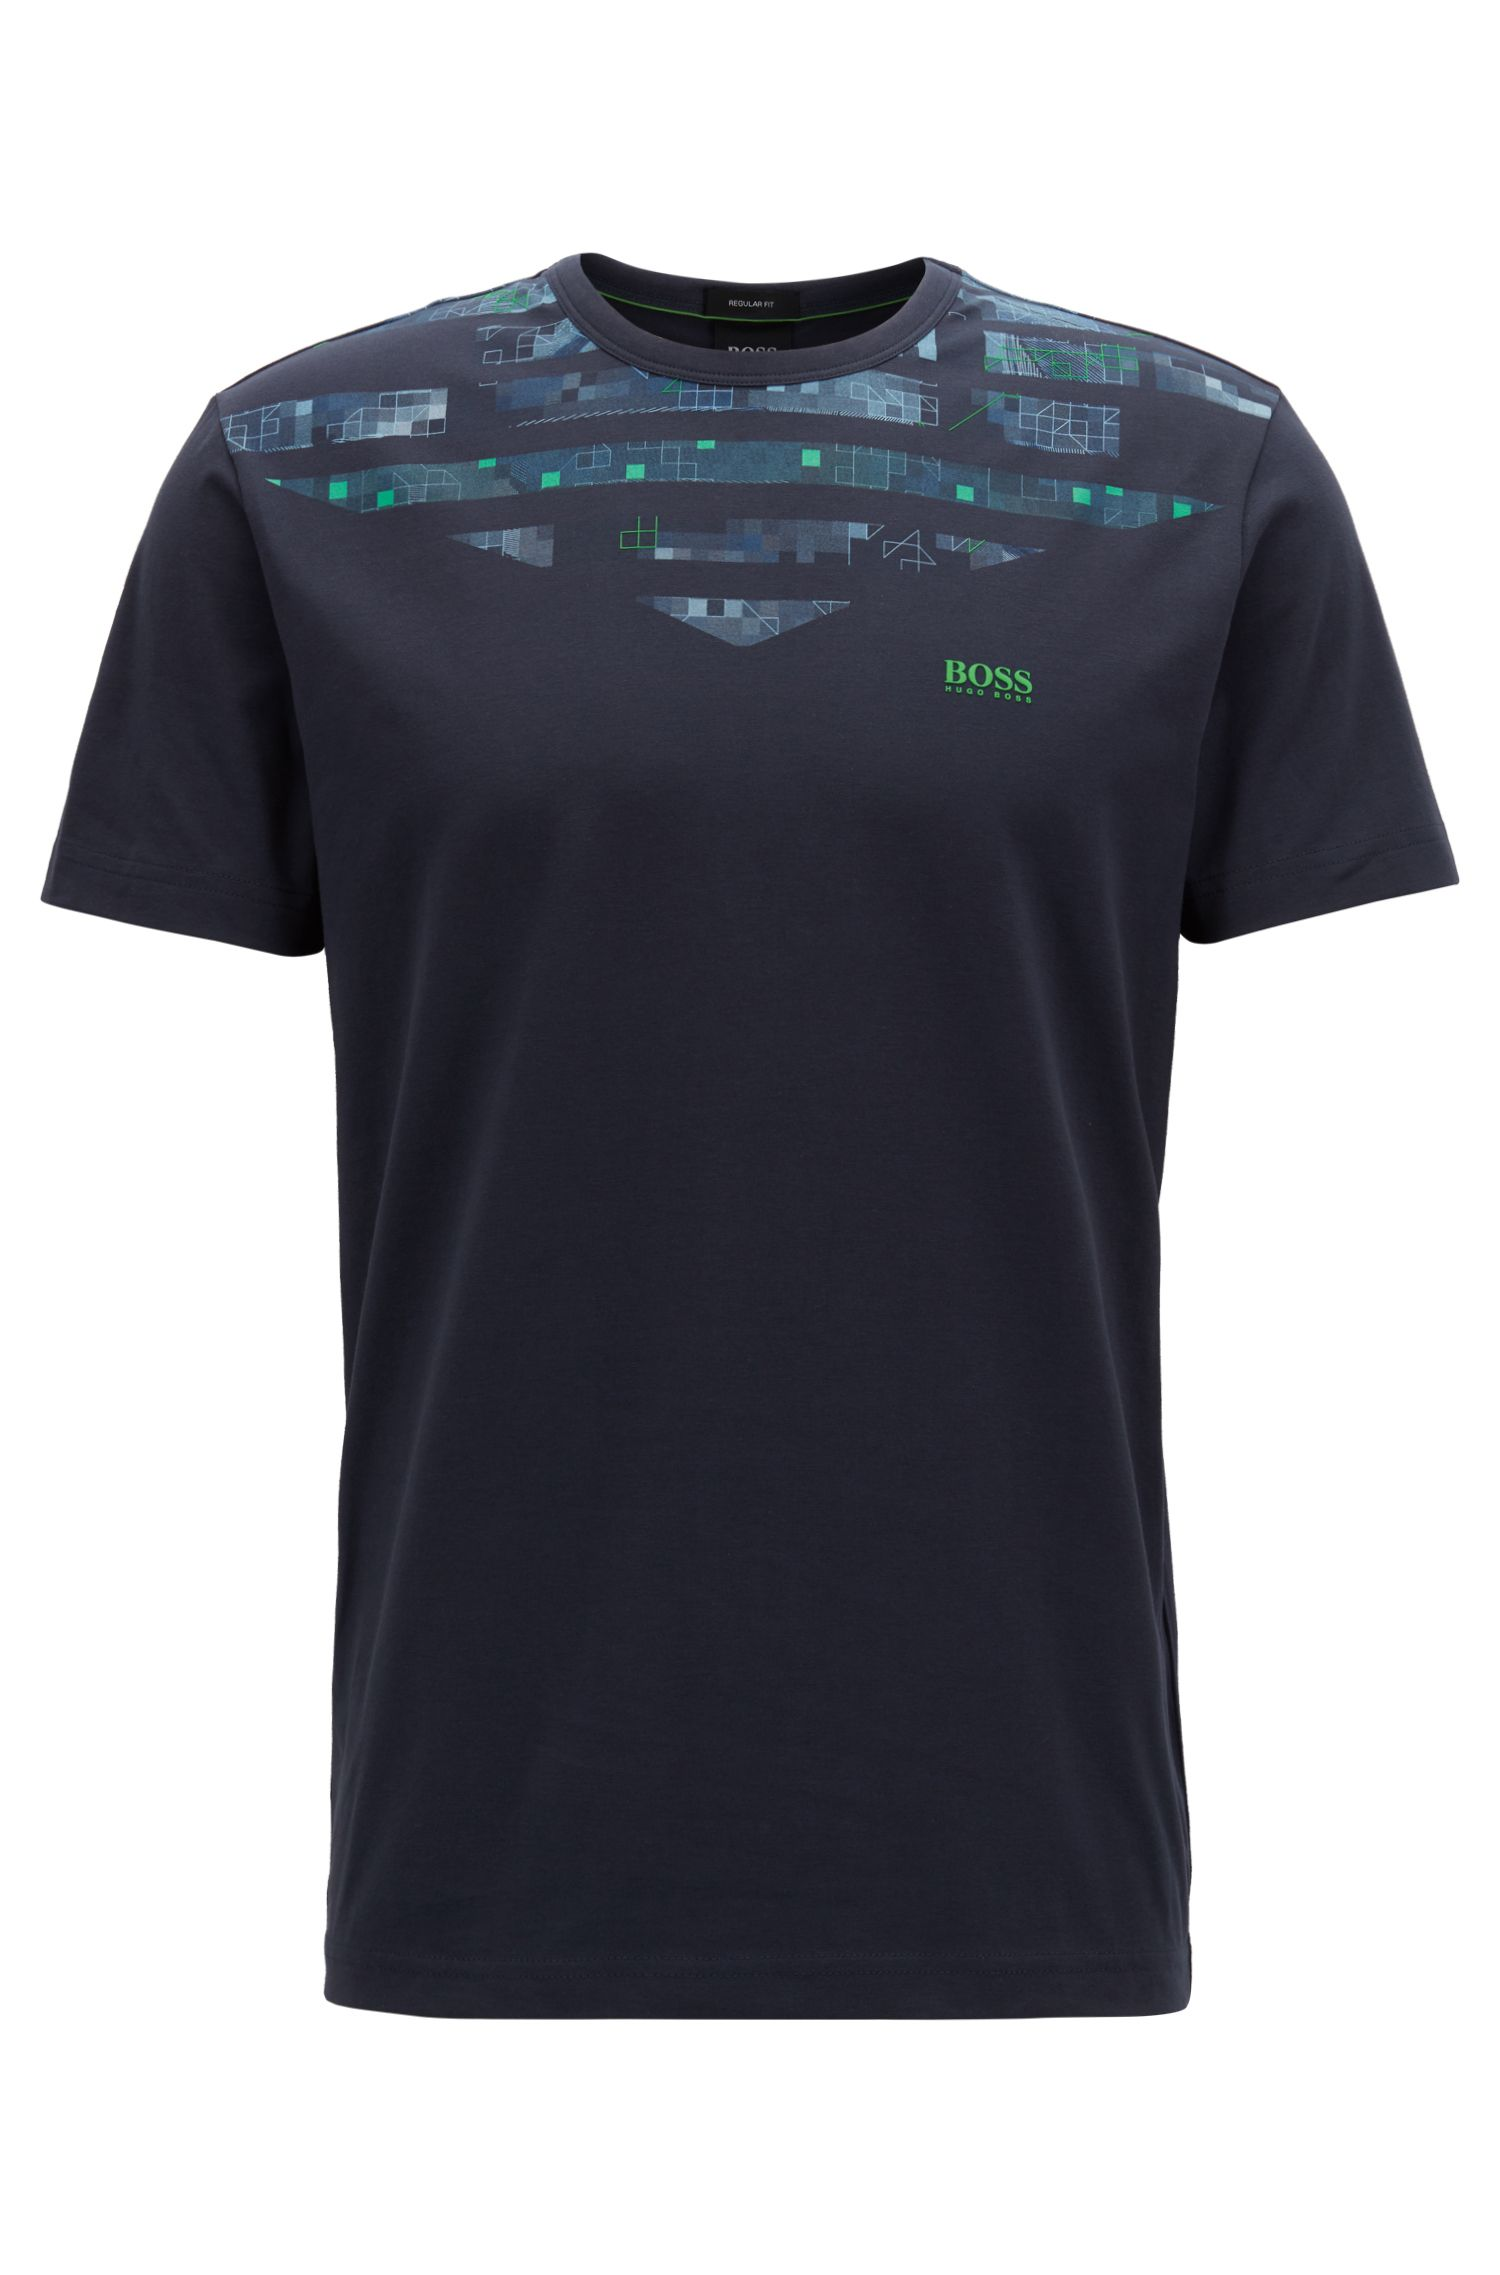 T-shirt van stretchkatoen met kunstzinnig seizoensthema